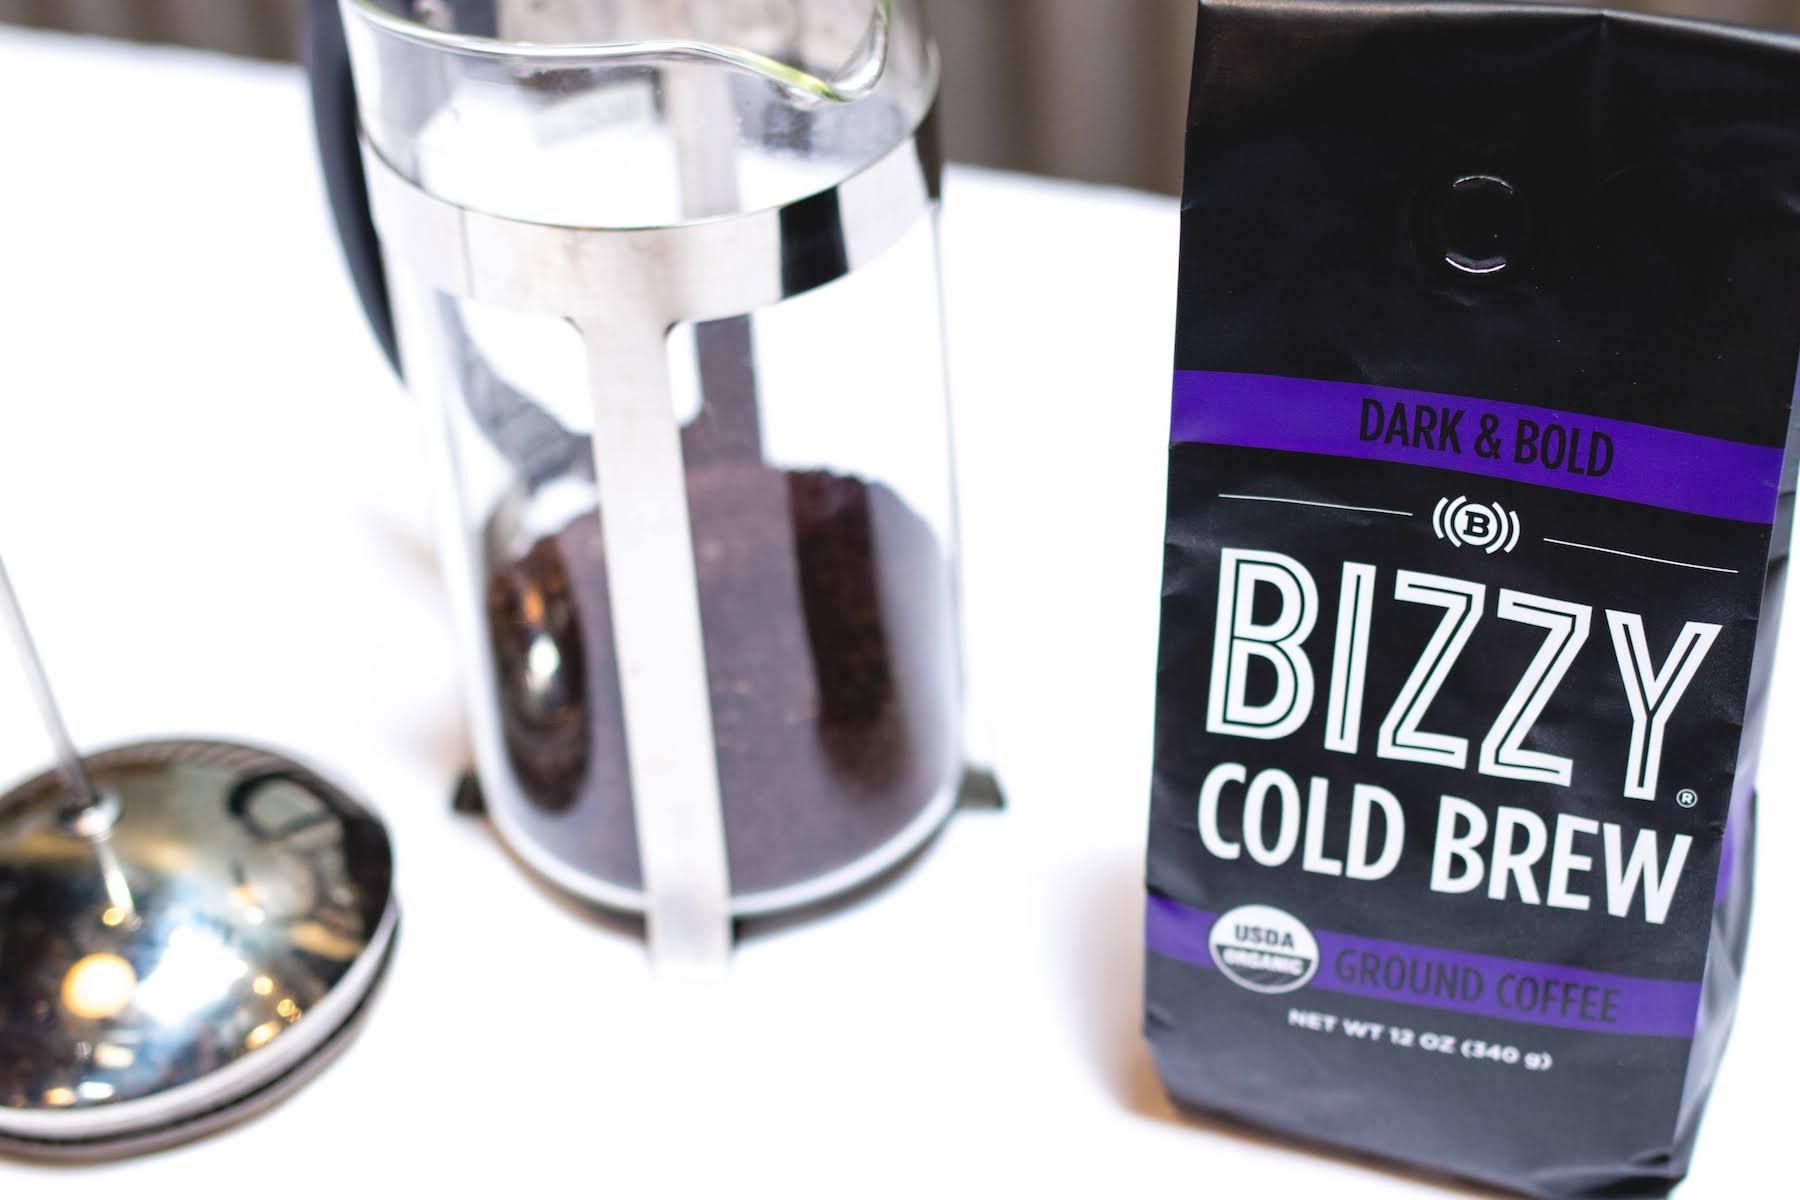 Bizzy Organic Cold Brew Coffee - Dark & Bold Blend - Coarse Ground Coffee - 12 oz by Bizzy (Image #5)